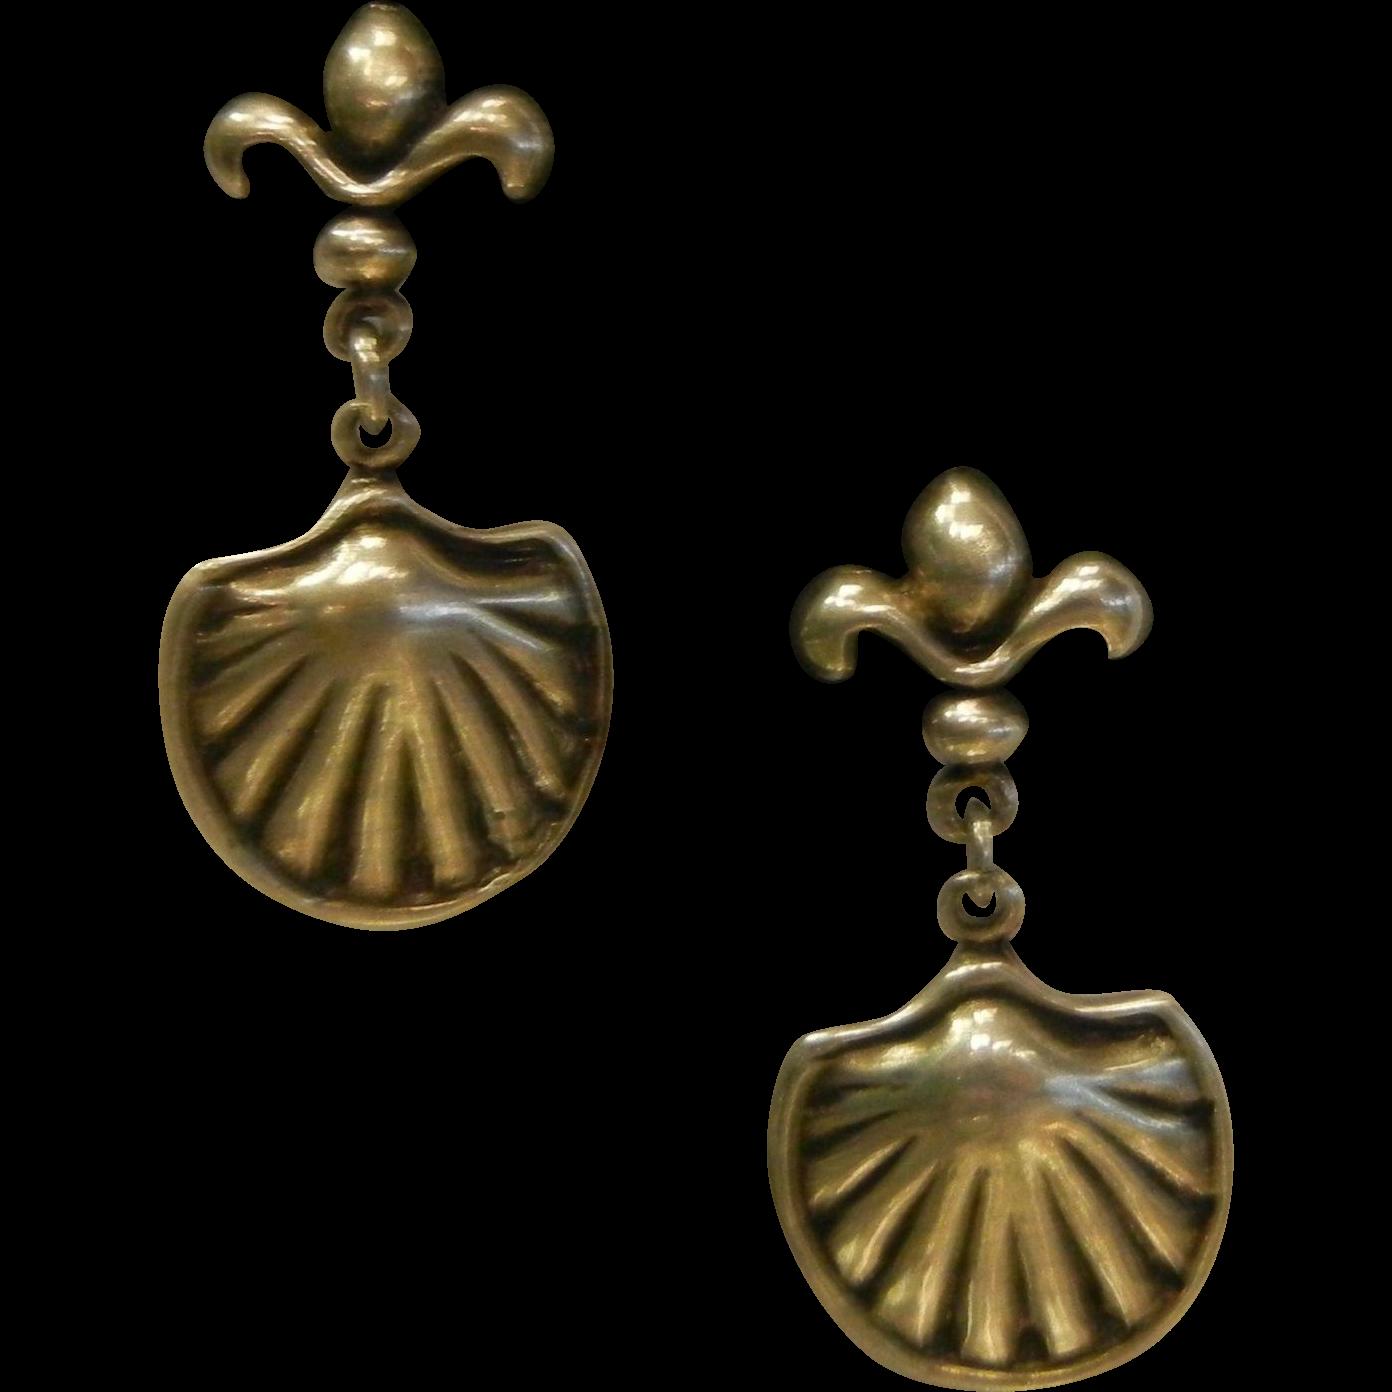 Fine Sterling Silver Shell Charm Earrings Signed JA